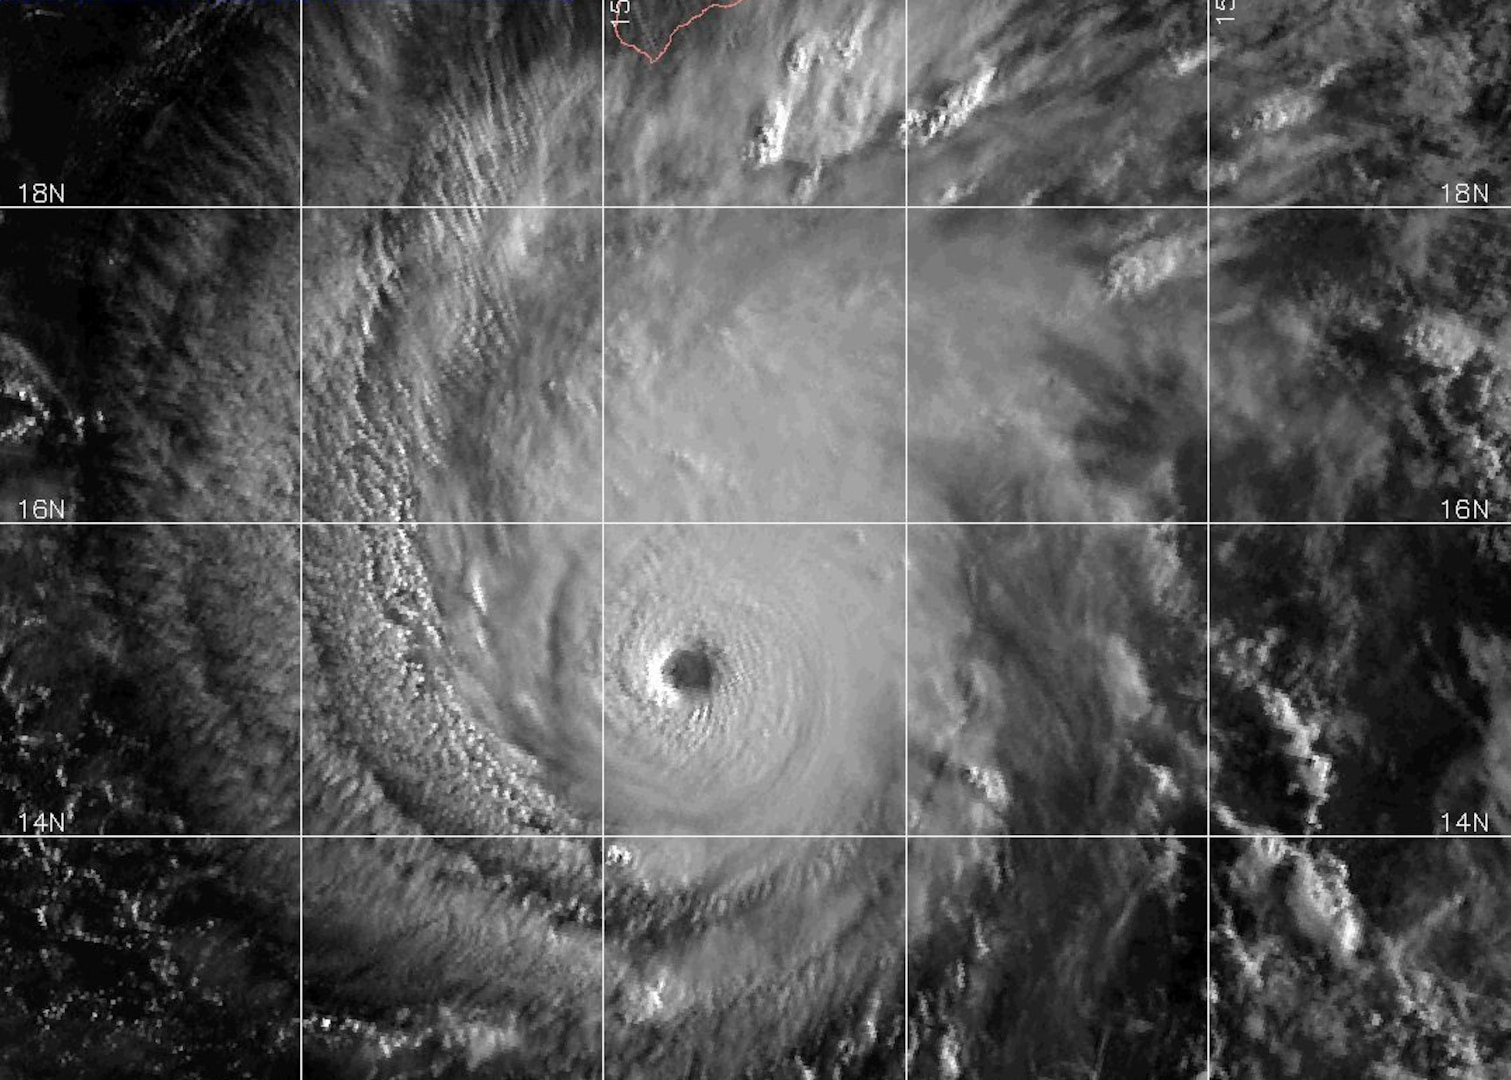 Hawaii-based ships to sortie ahead of Hurricane Lane